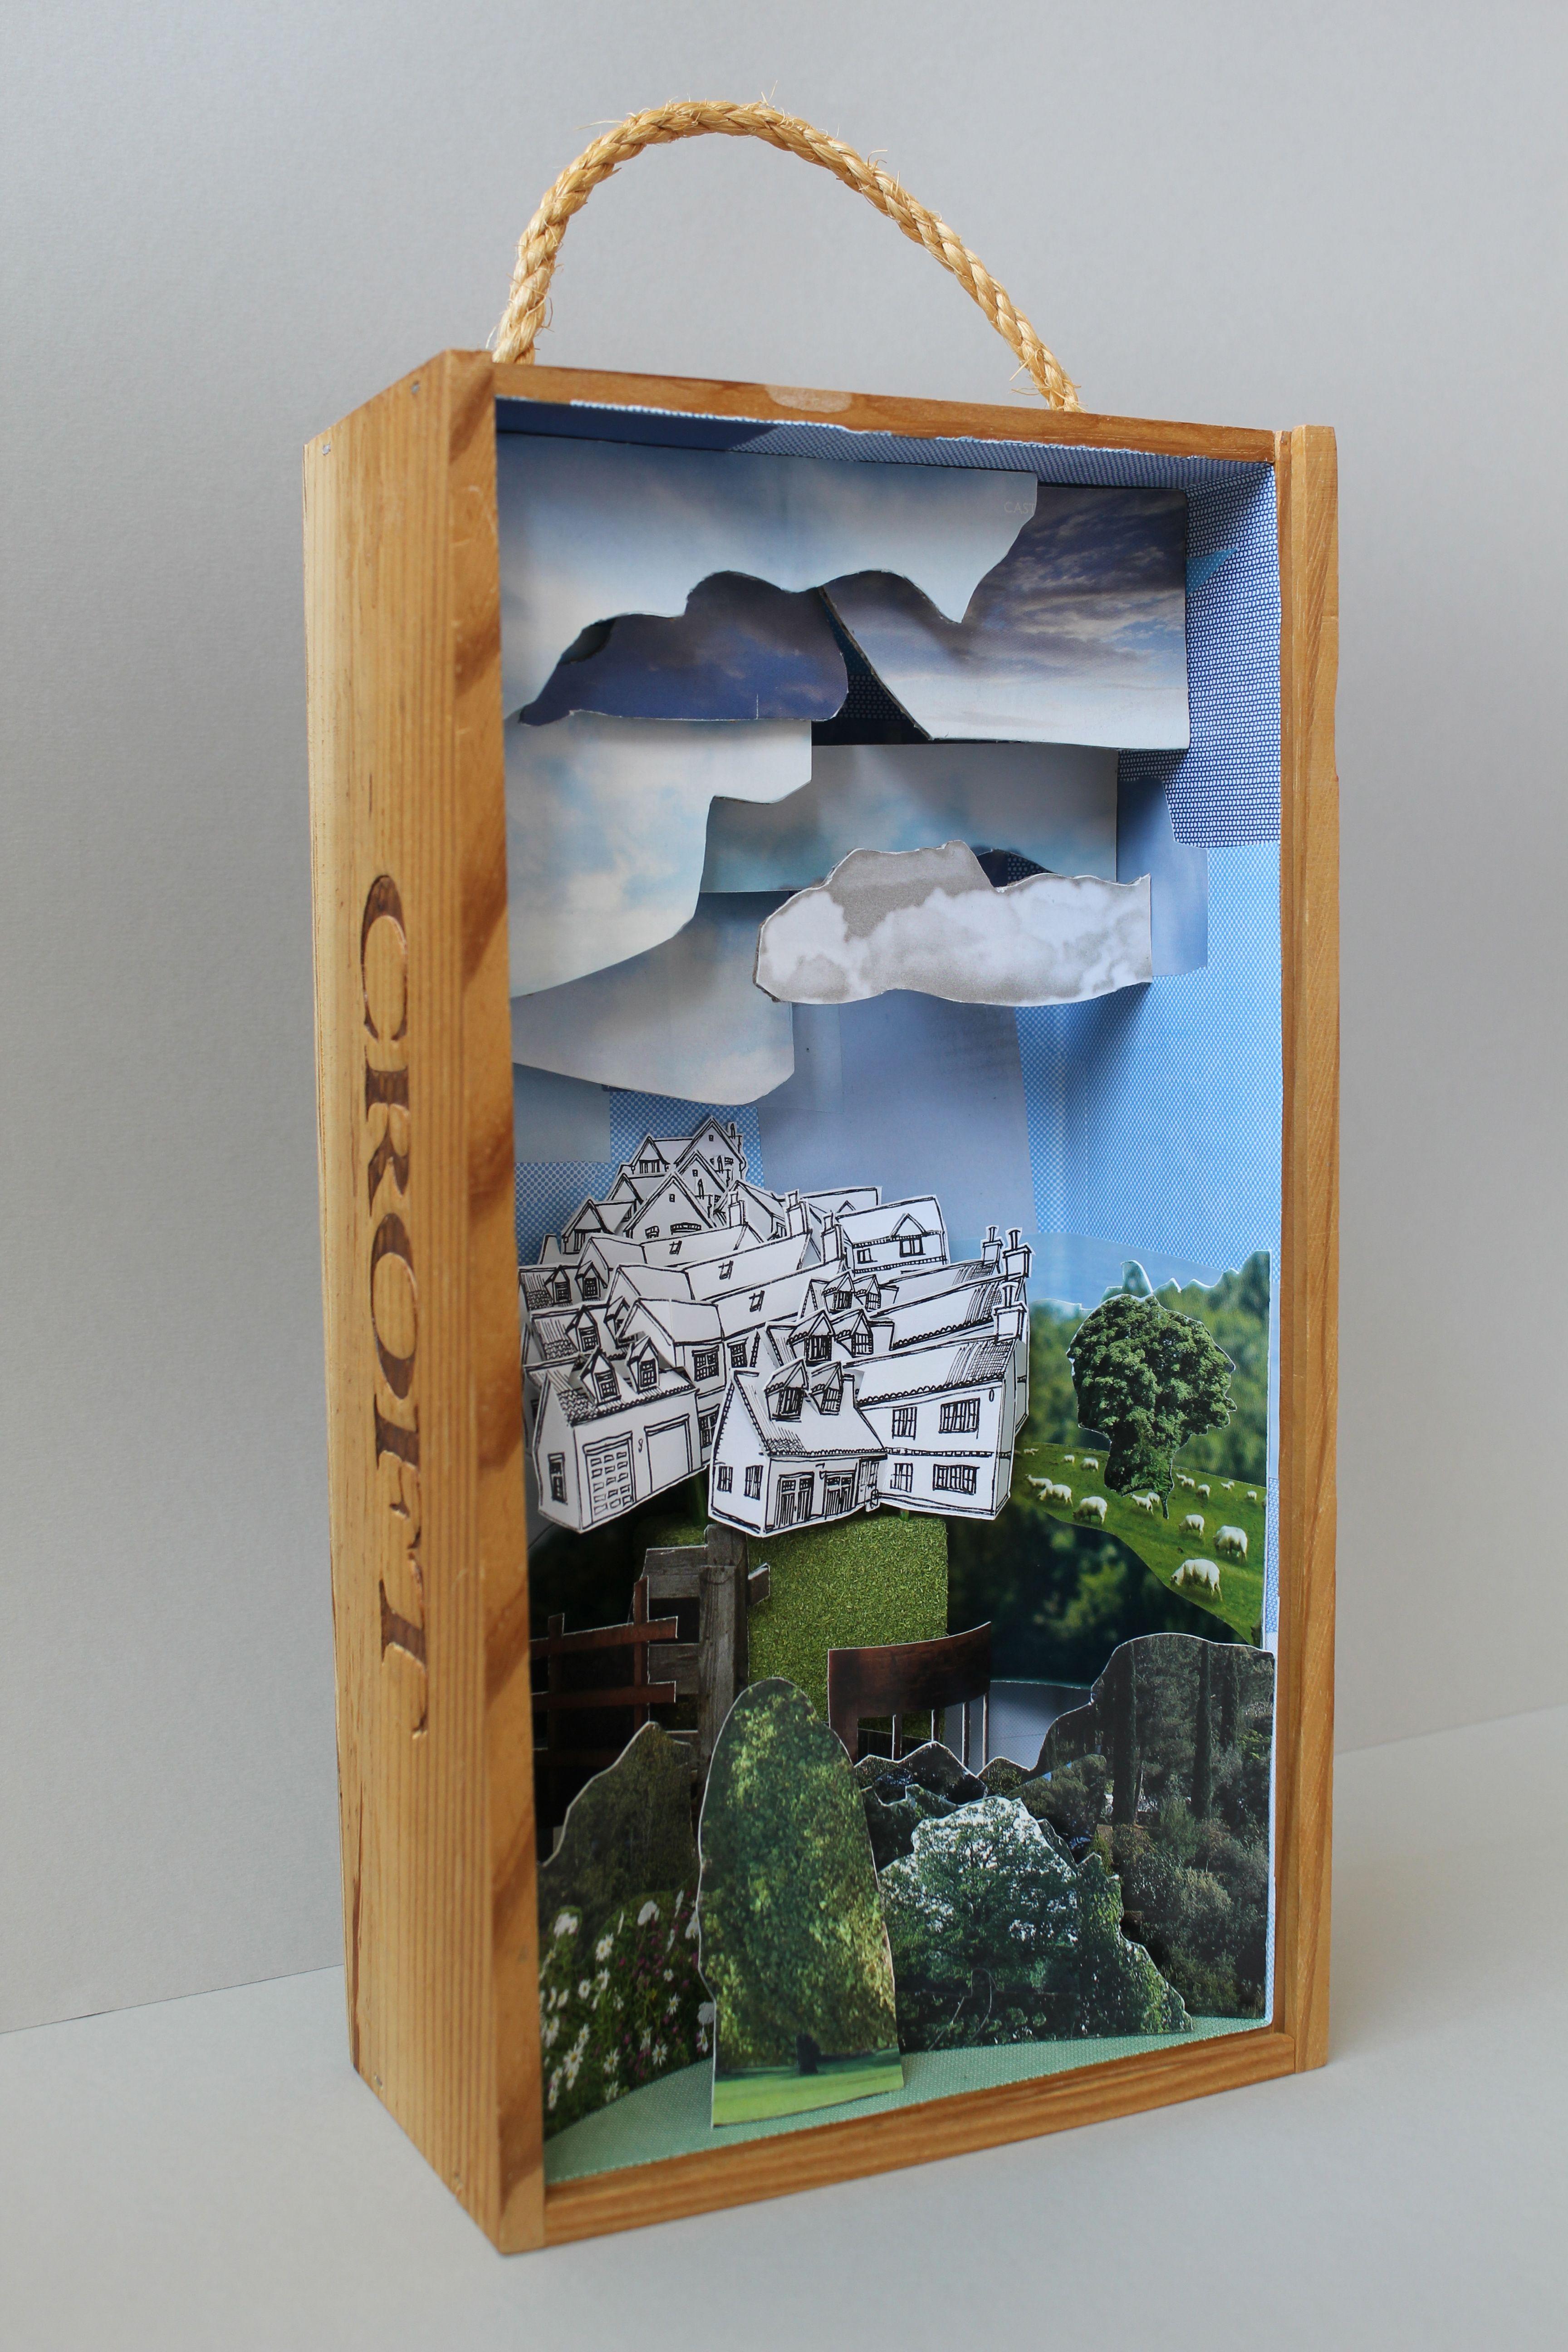 Mandy Bray | 'Croft', box sculpture, mixed media, 2014.